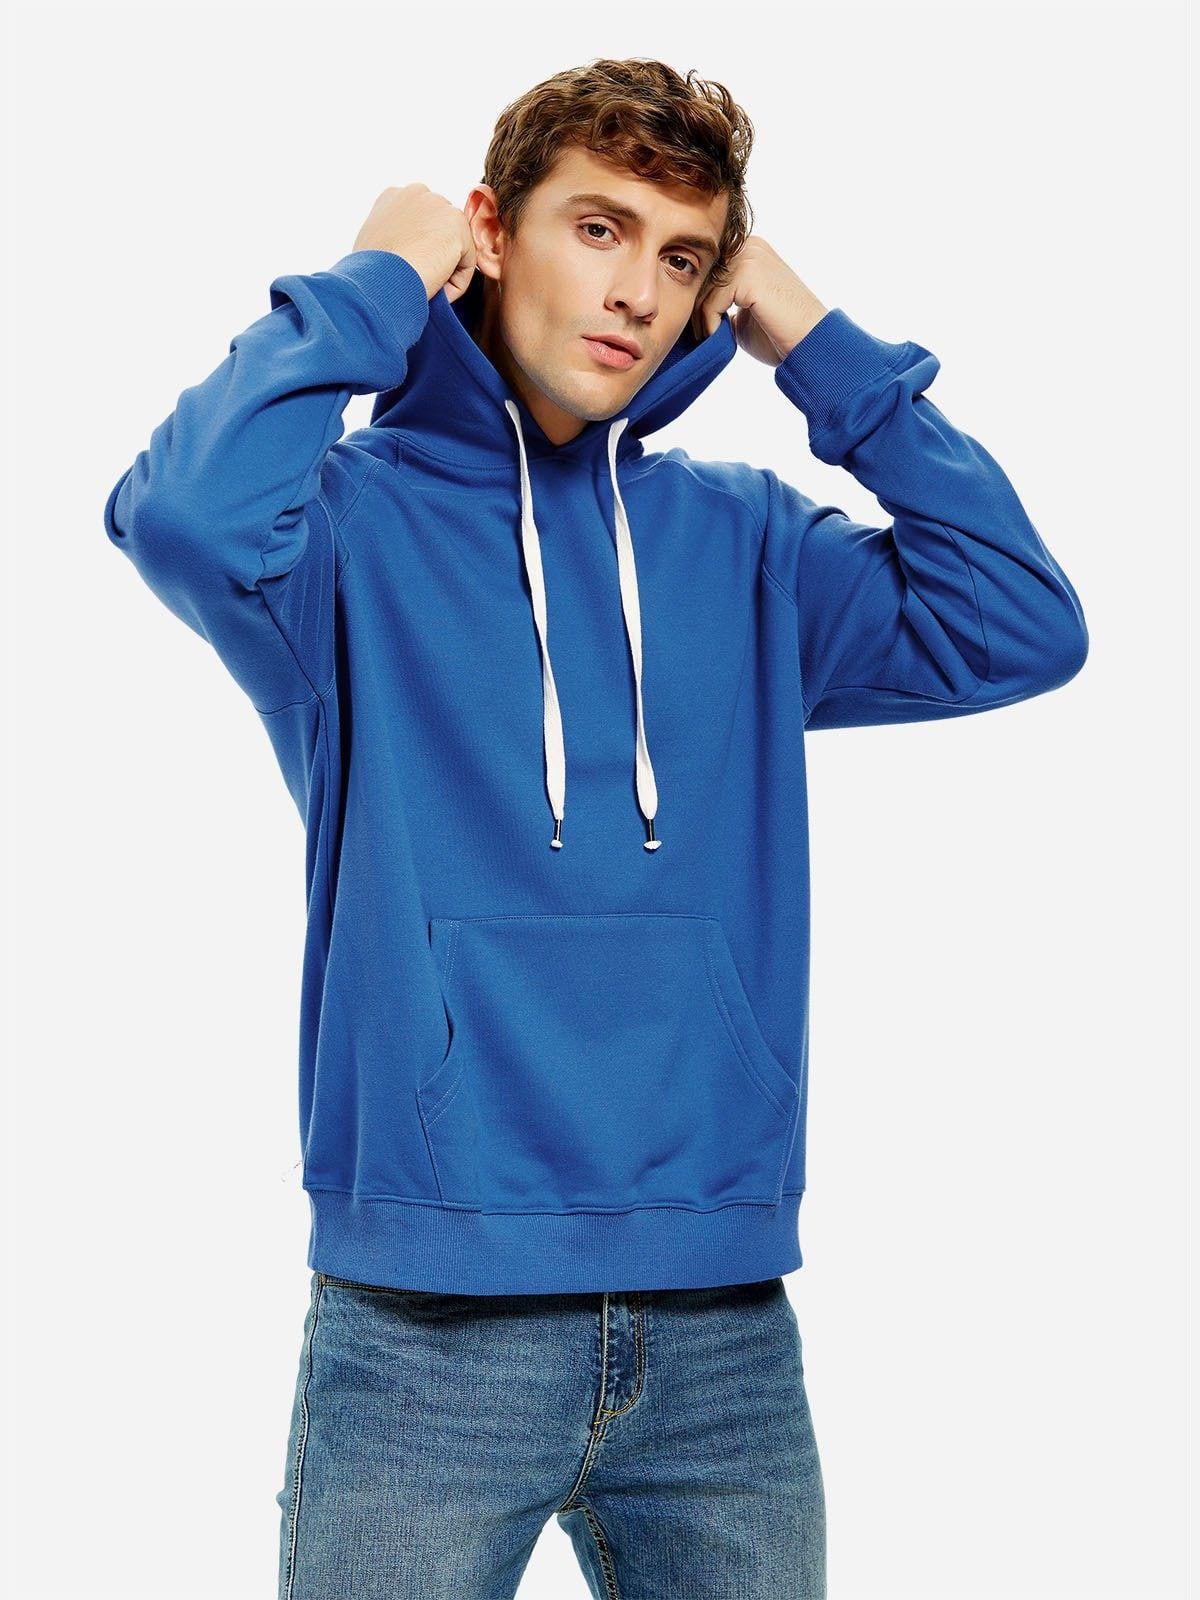 Zan Style Hooded Sweatshirt Blackish Green Blue Light Gray Mens Sweatshirts Hoodie Womens Sweatshirts Fashion Hooded Sweatshirts [ 1600 x 1200 Pixel ]